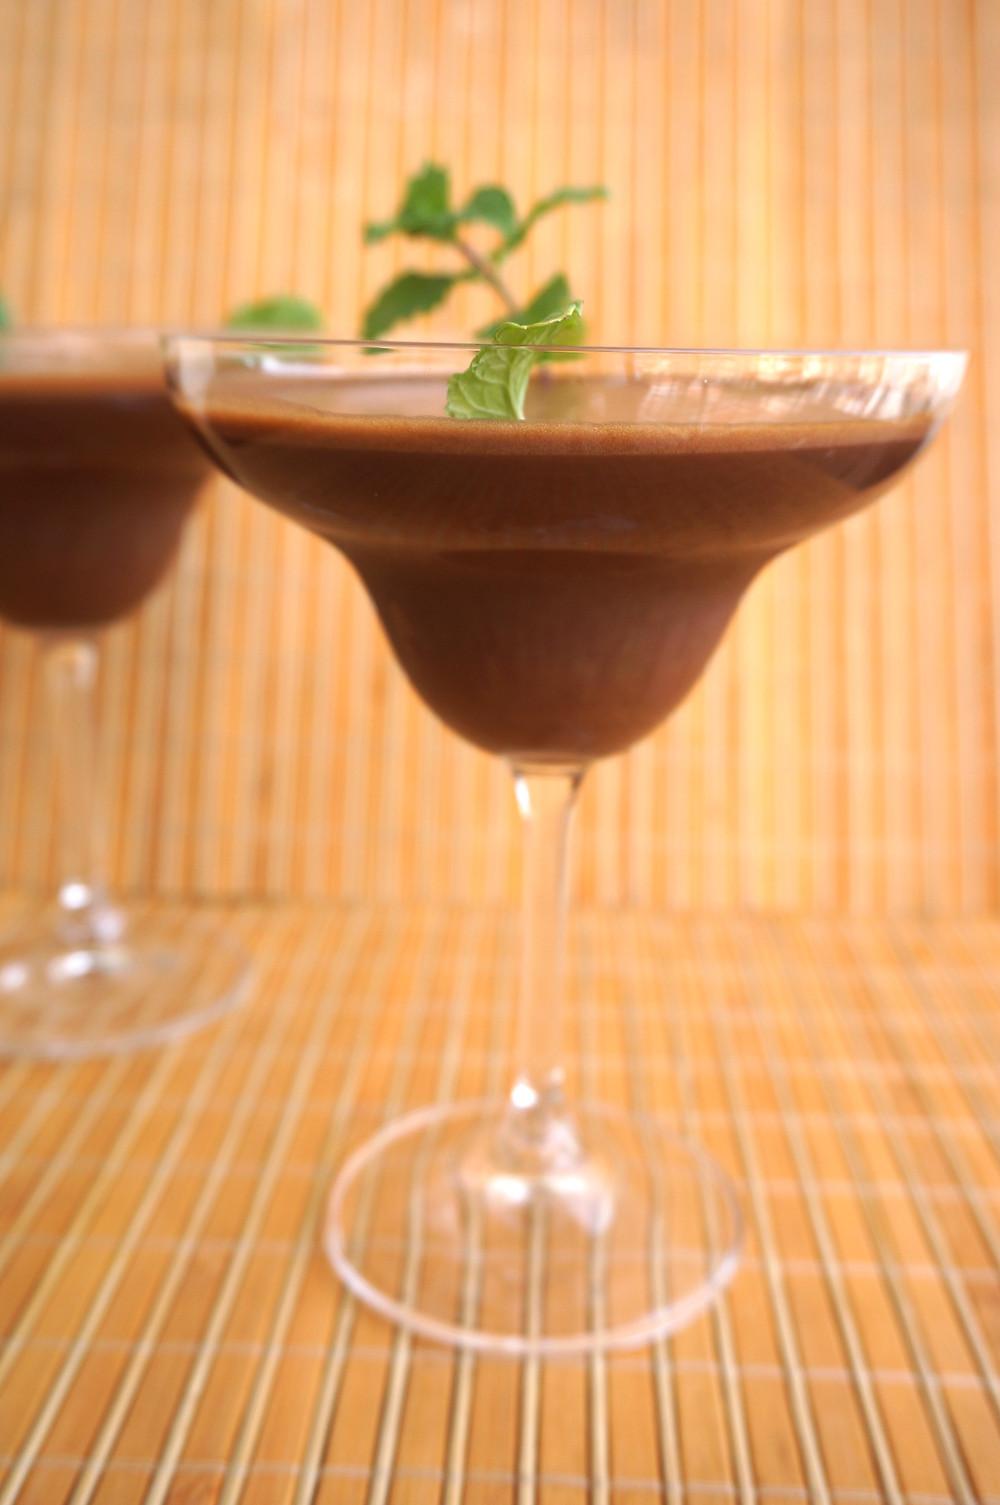 mousse de chocolate sem ovos 2_edited.JPG